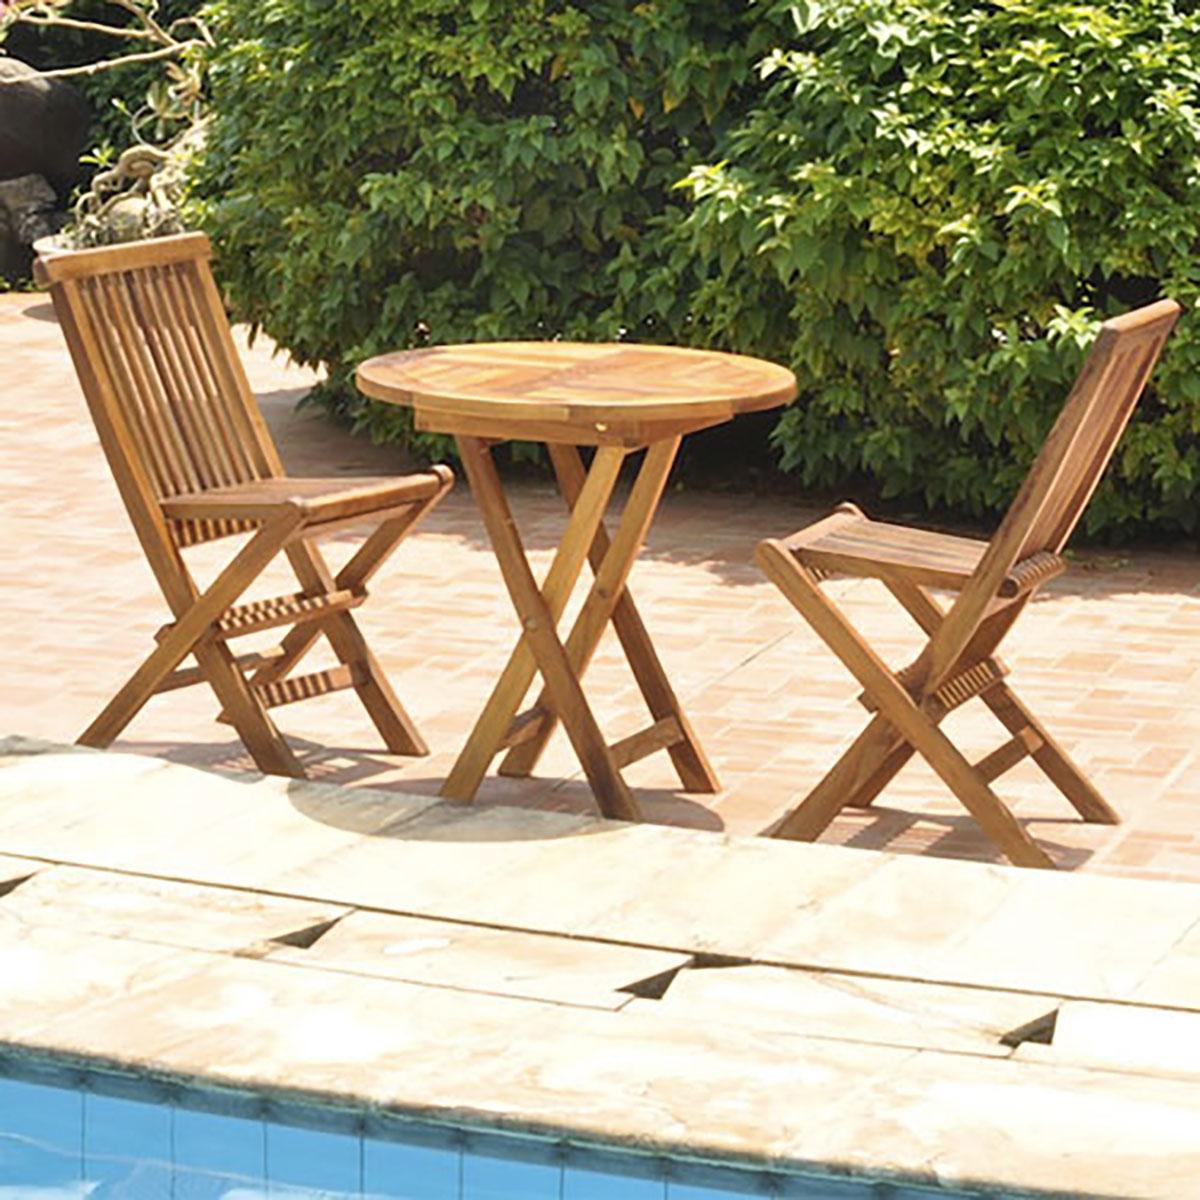 Chaises de jardin pliantes topiwall - Chaise pliante salon ...